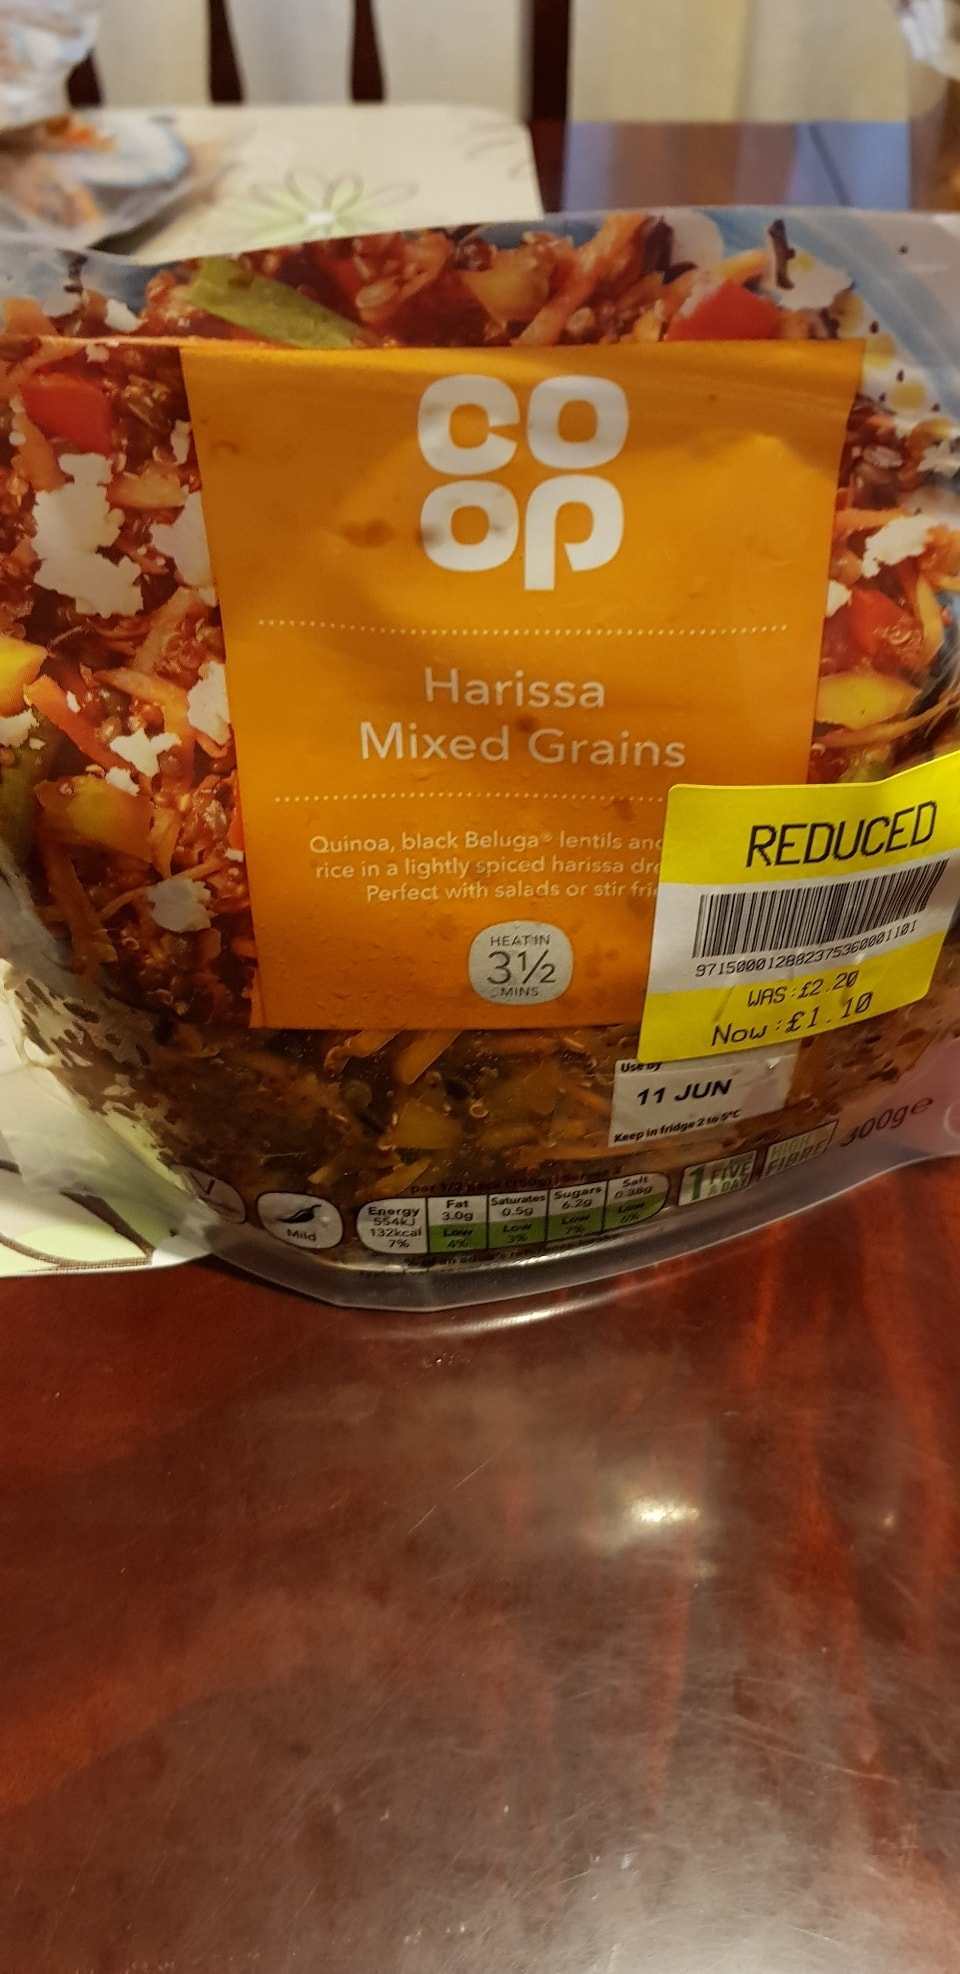 Harissa mixed grains